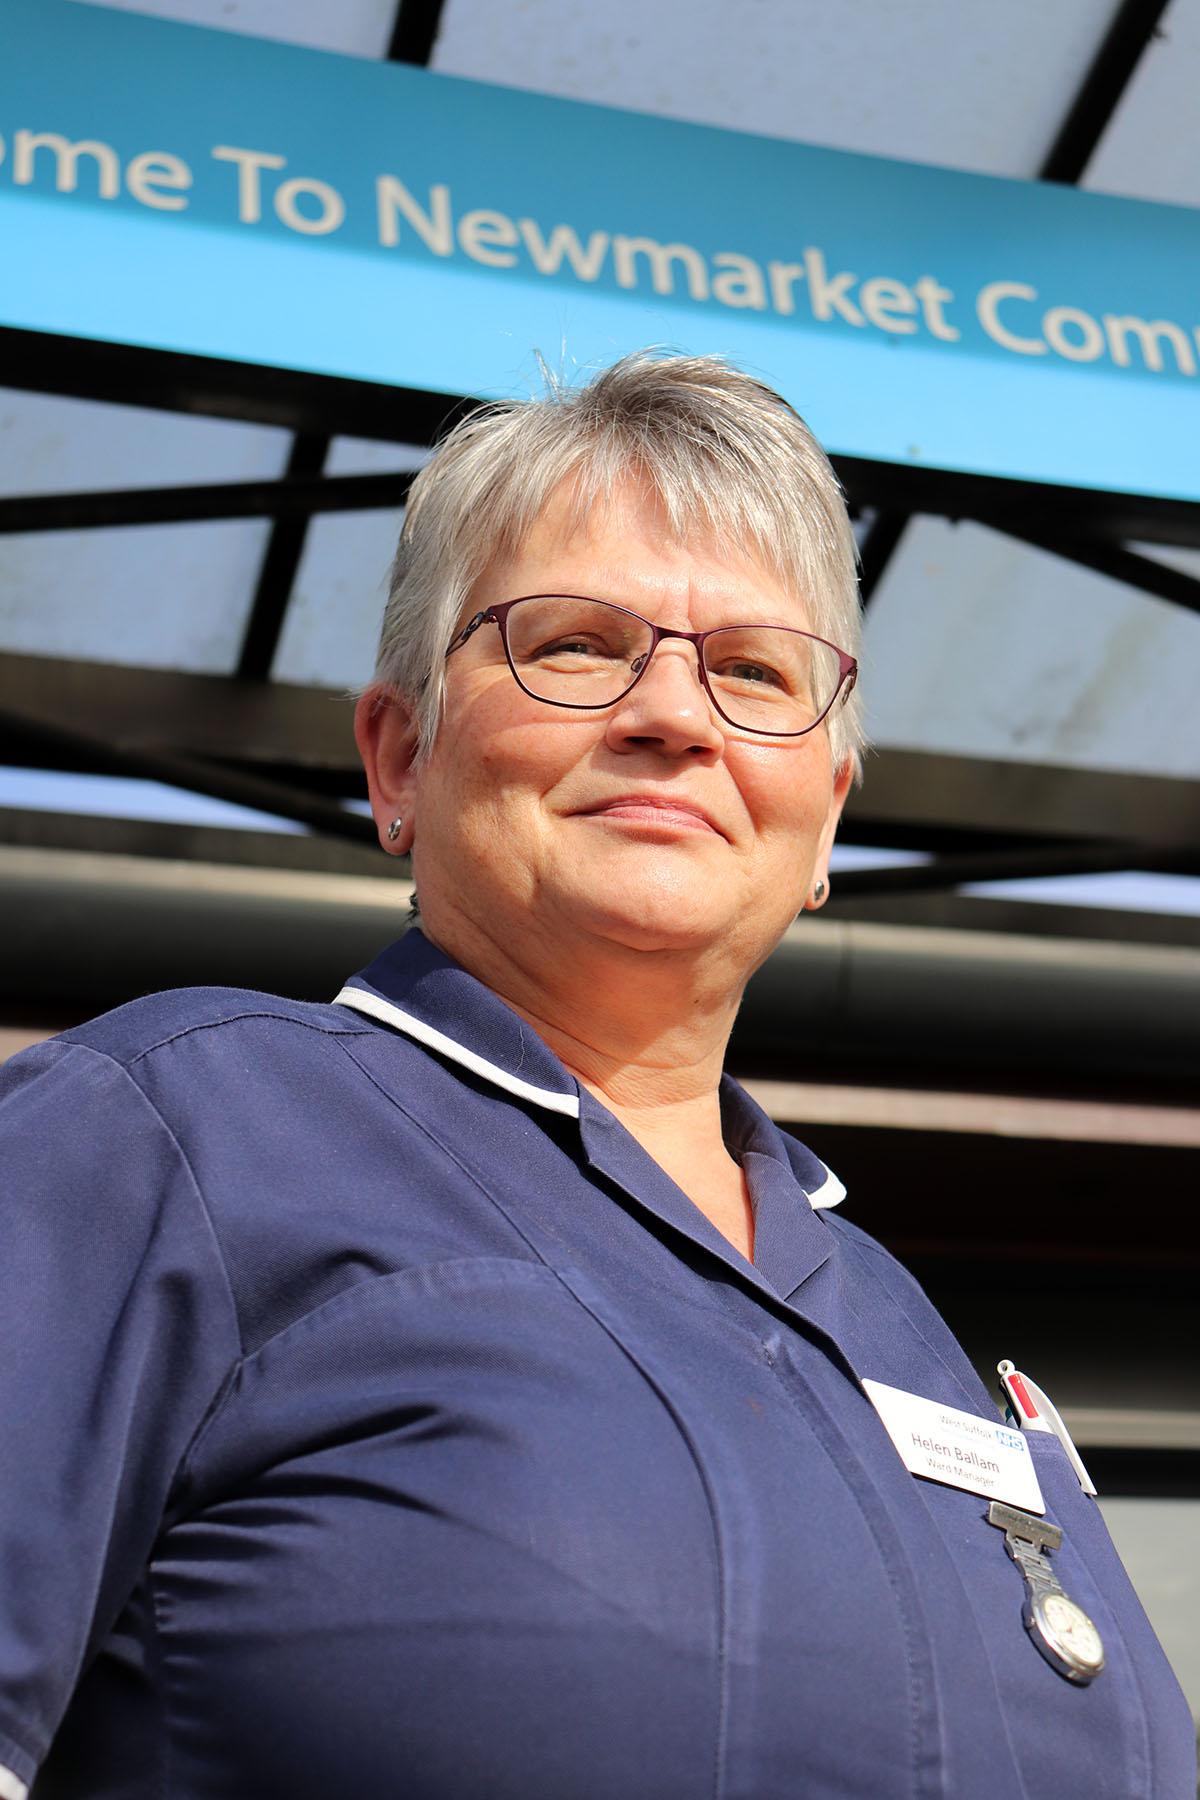 Newmarket Hospital's Rosemary Ward manager Helen Ballam